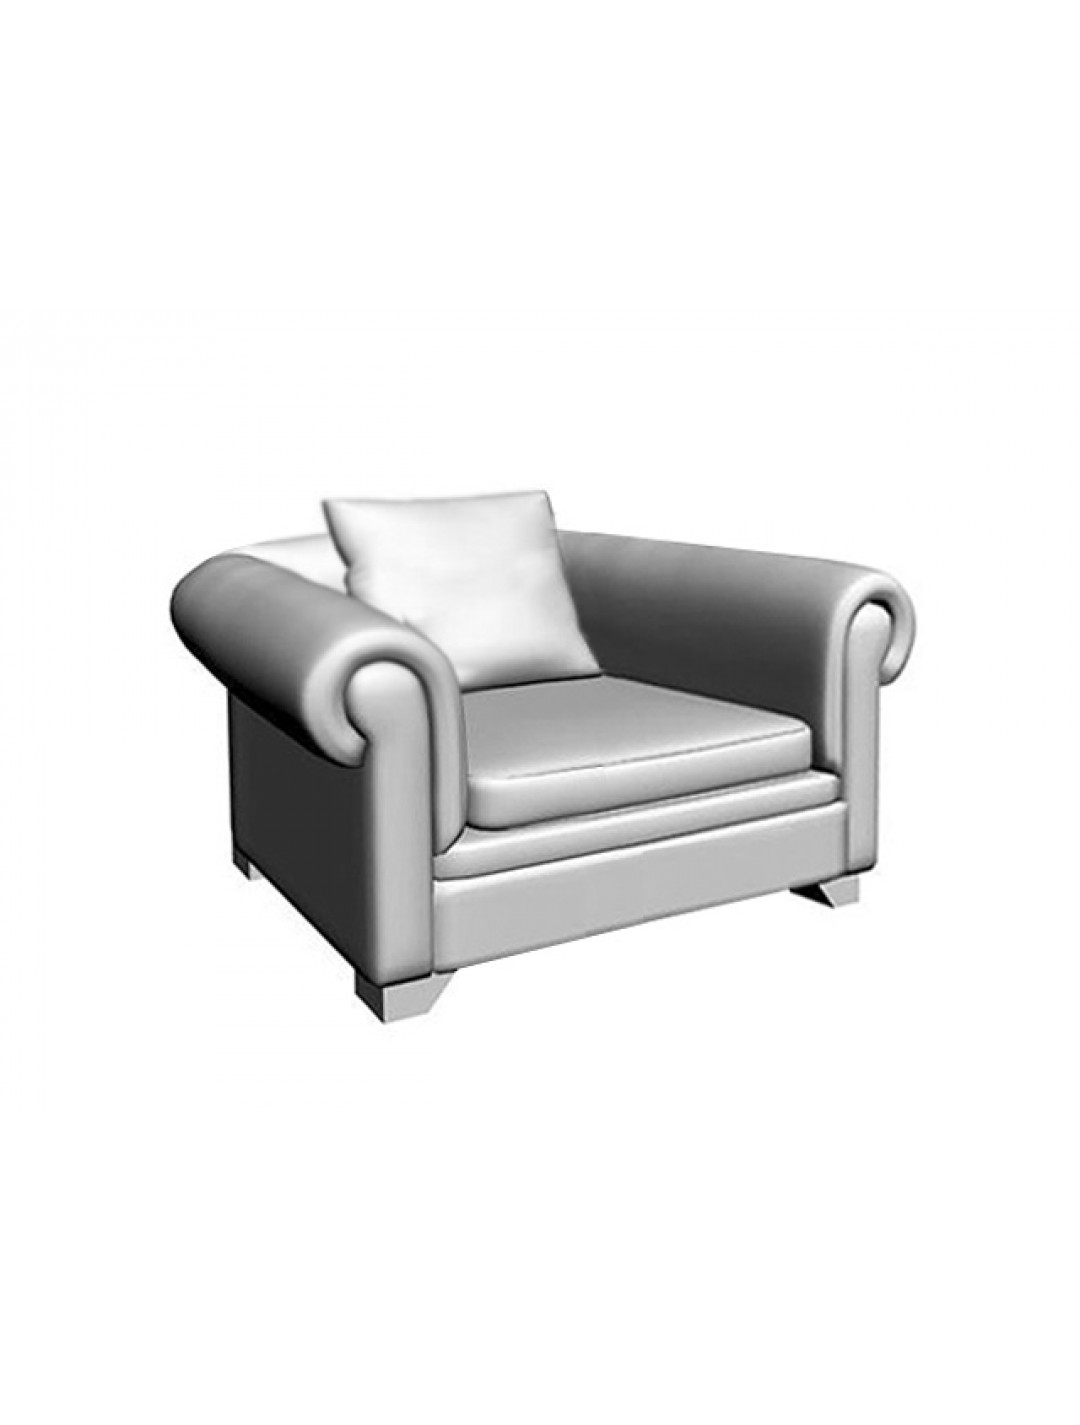 VICTORIA CAPITONE 1-SEAT SOFA,1 (60X60 CM) CUSHION, C.O.M.